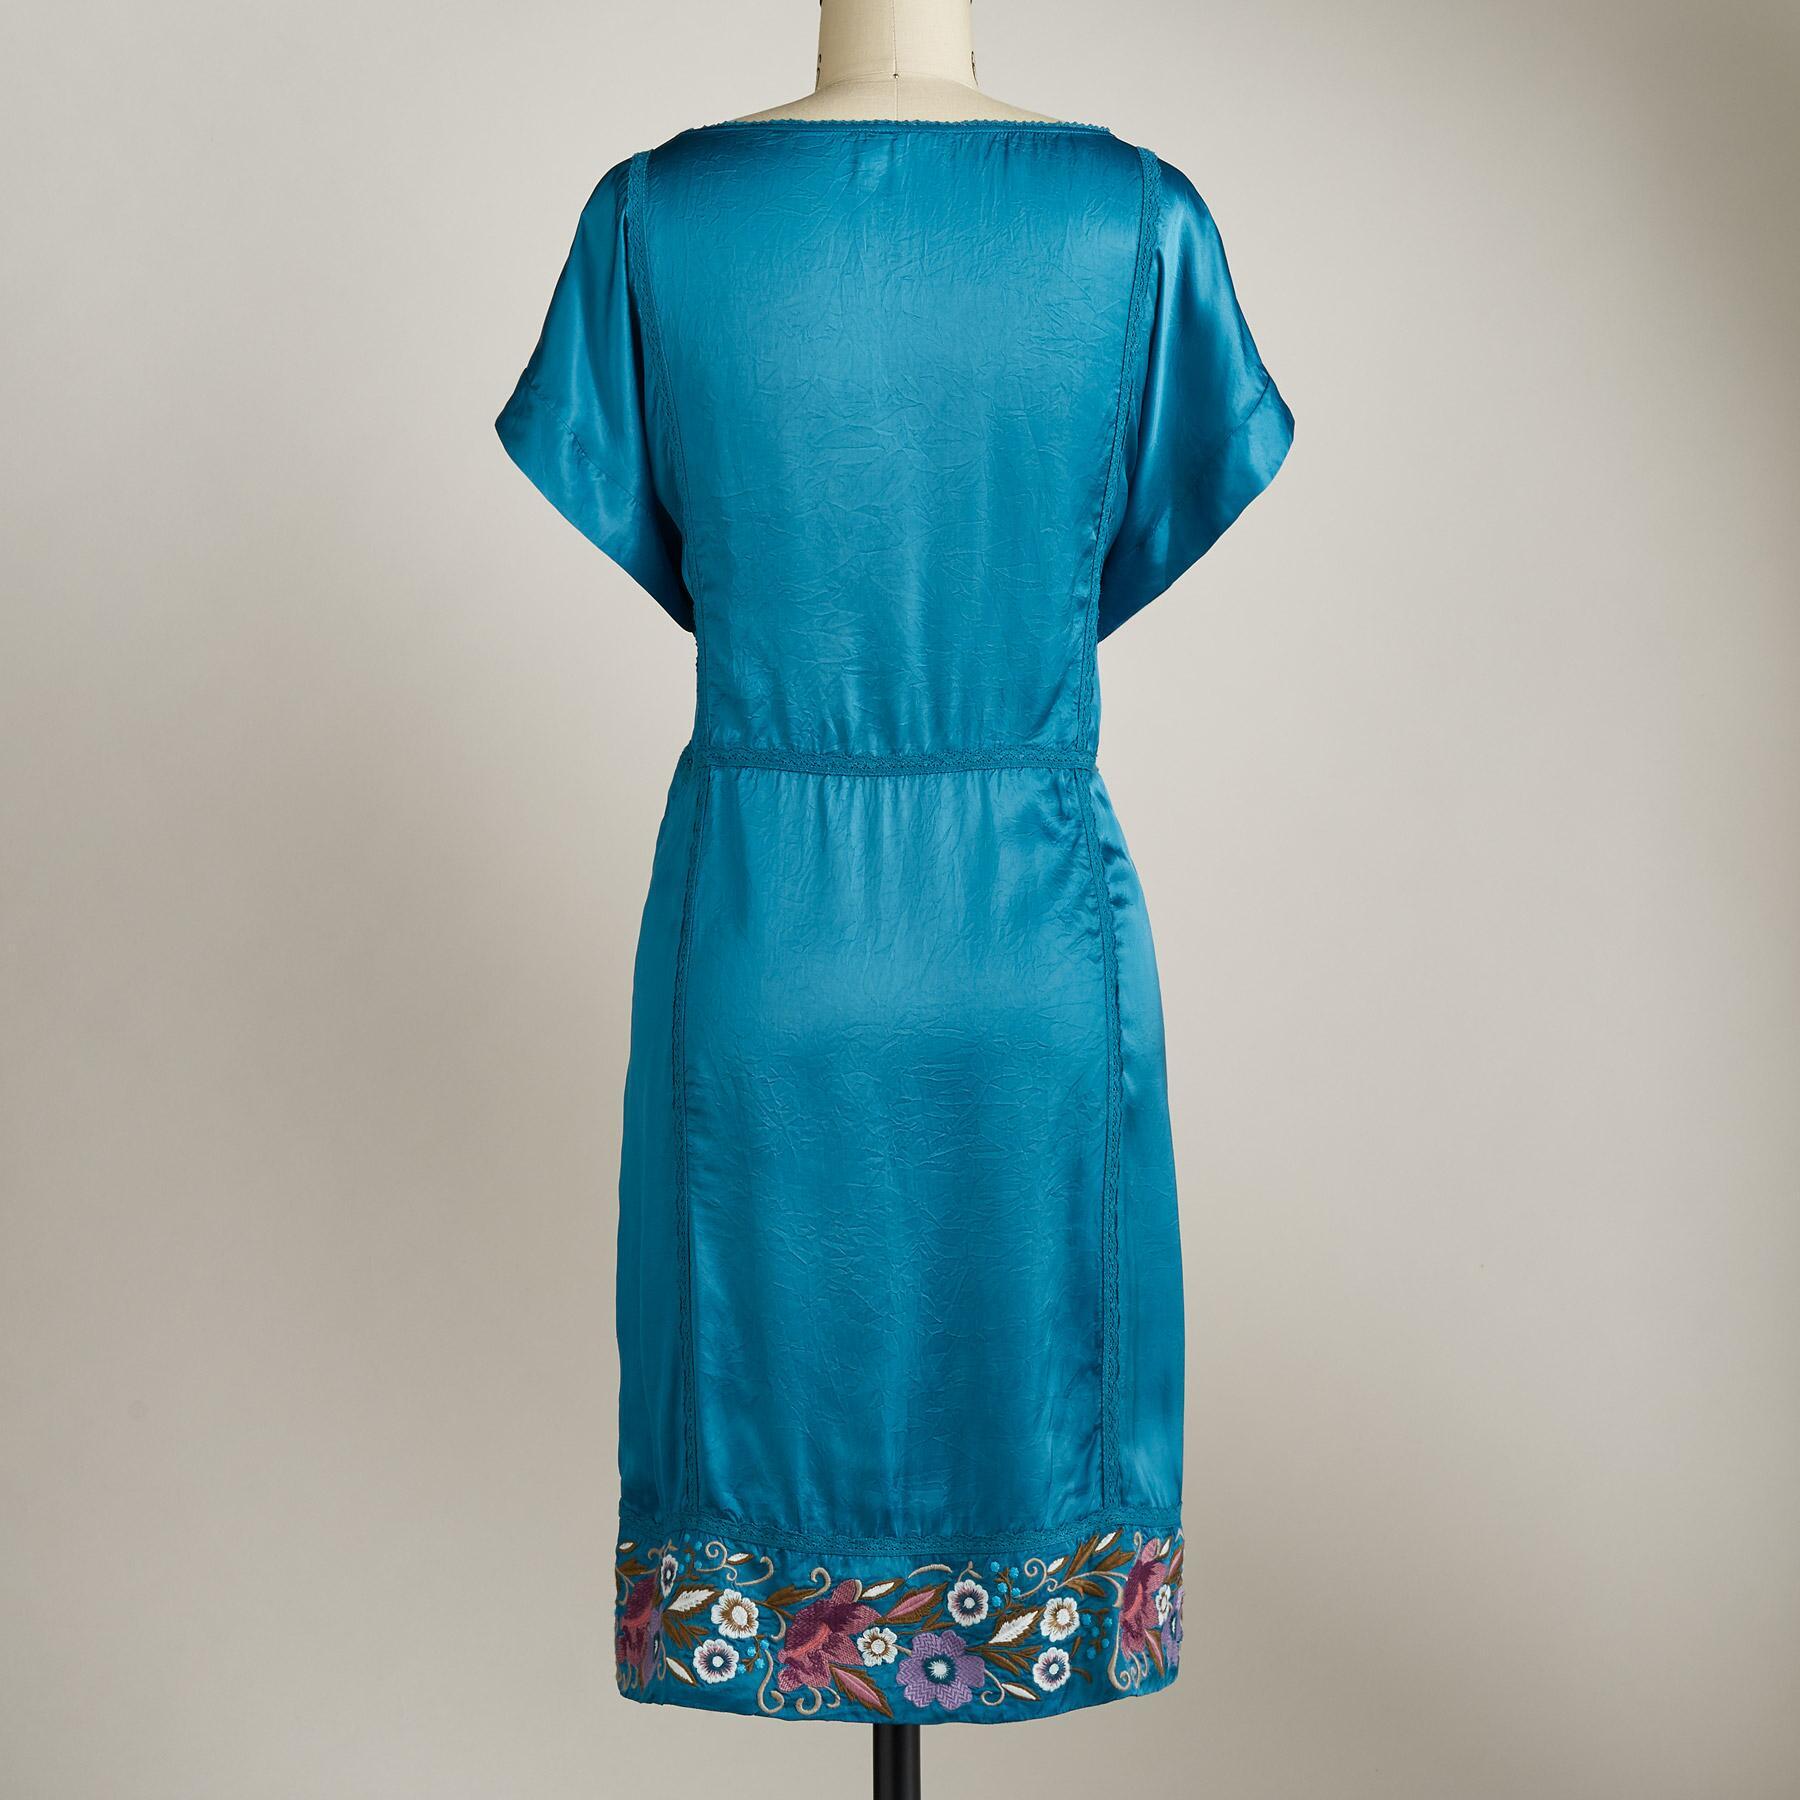 MALIKA DRESS - PETITES: View 3